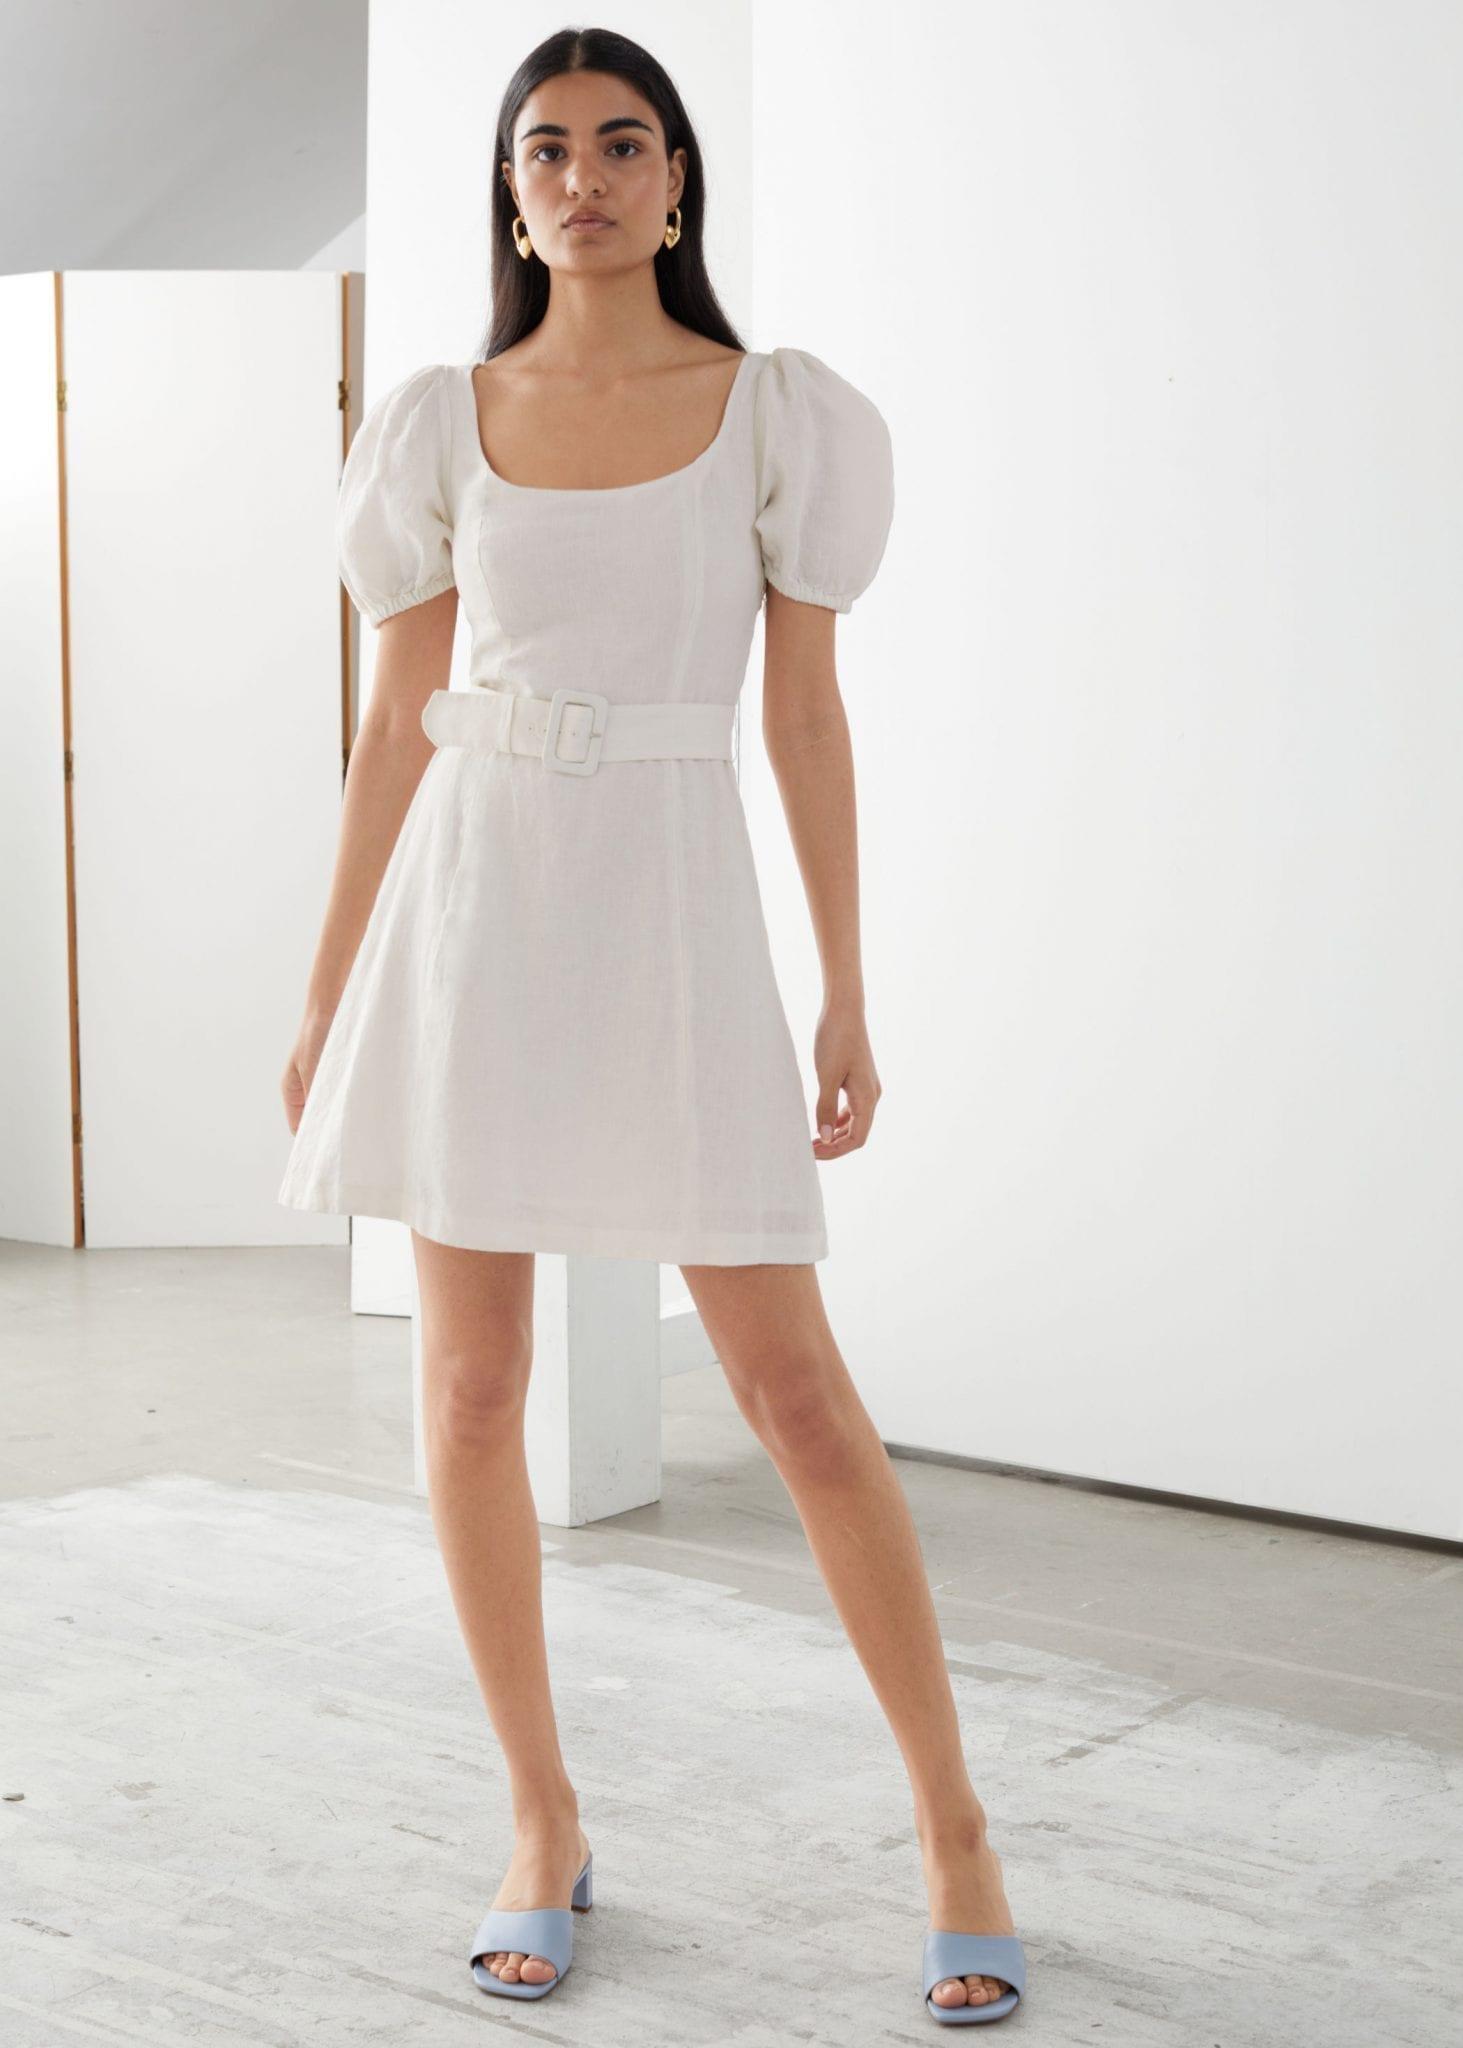 & OTHER STORIES Linen Puff Sleeve Mini Dress